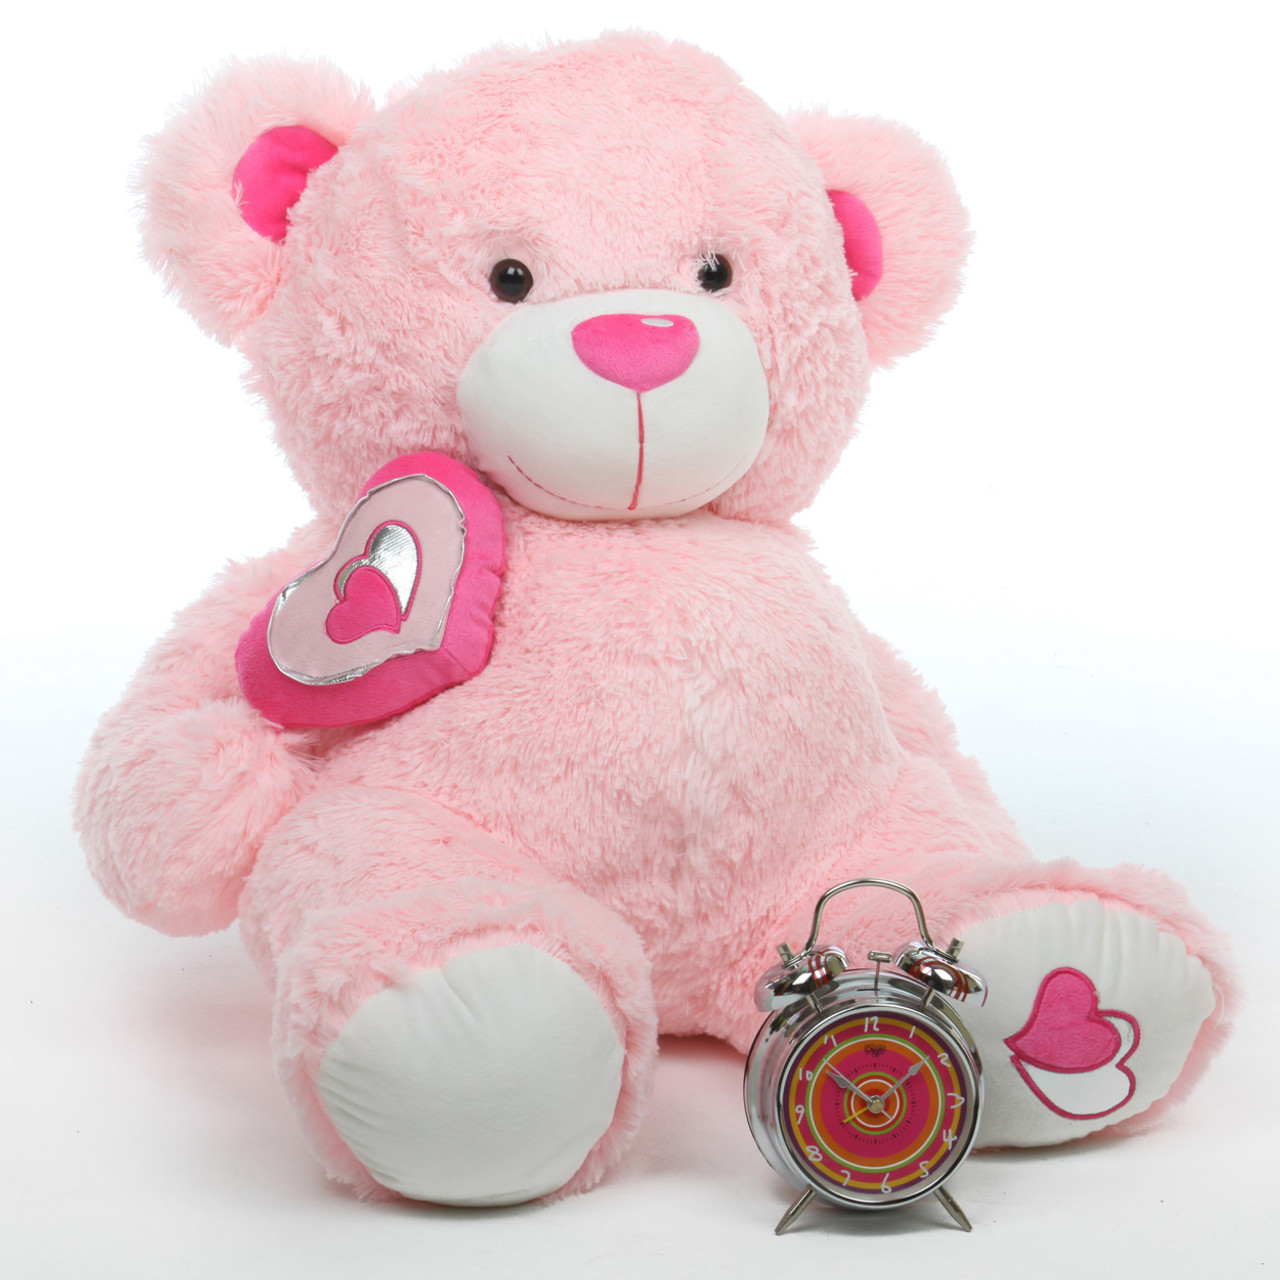 Cutie Pie Big Love 30 Pink Big Stuffed Teddy Bear Giant